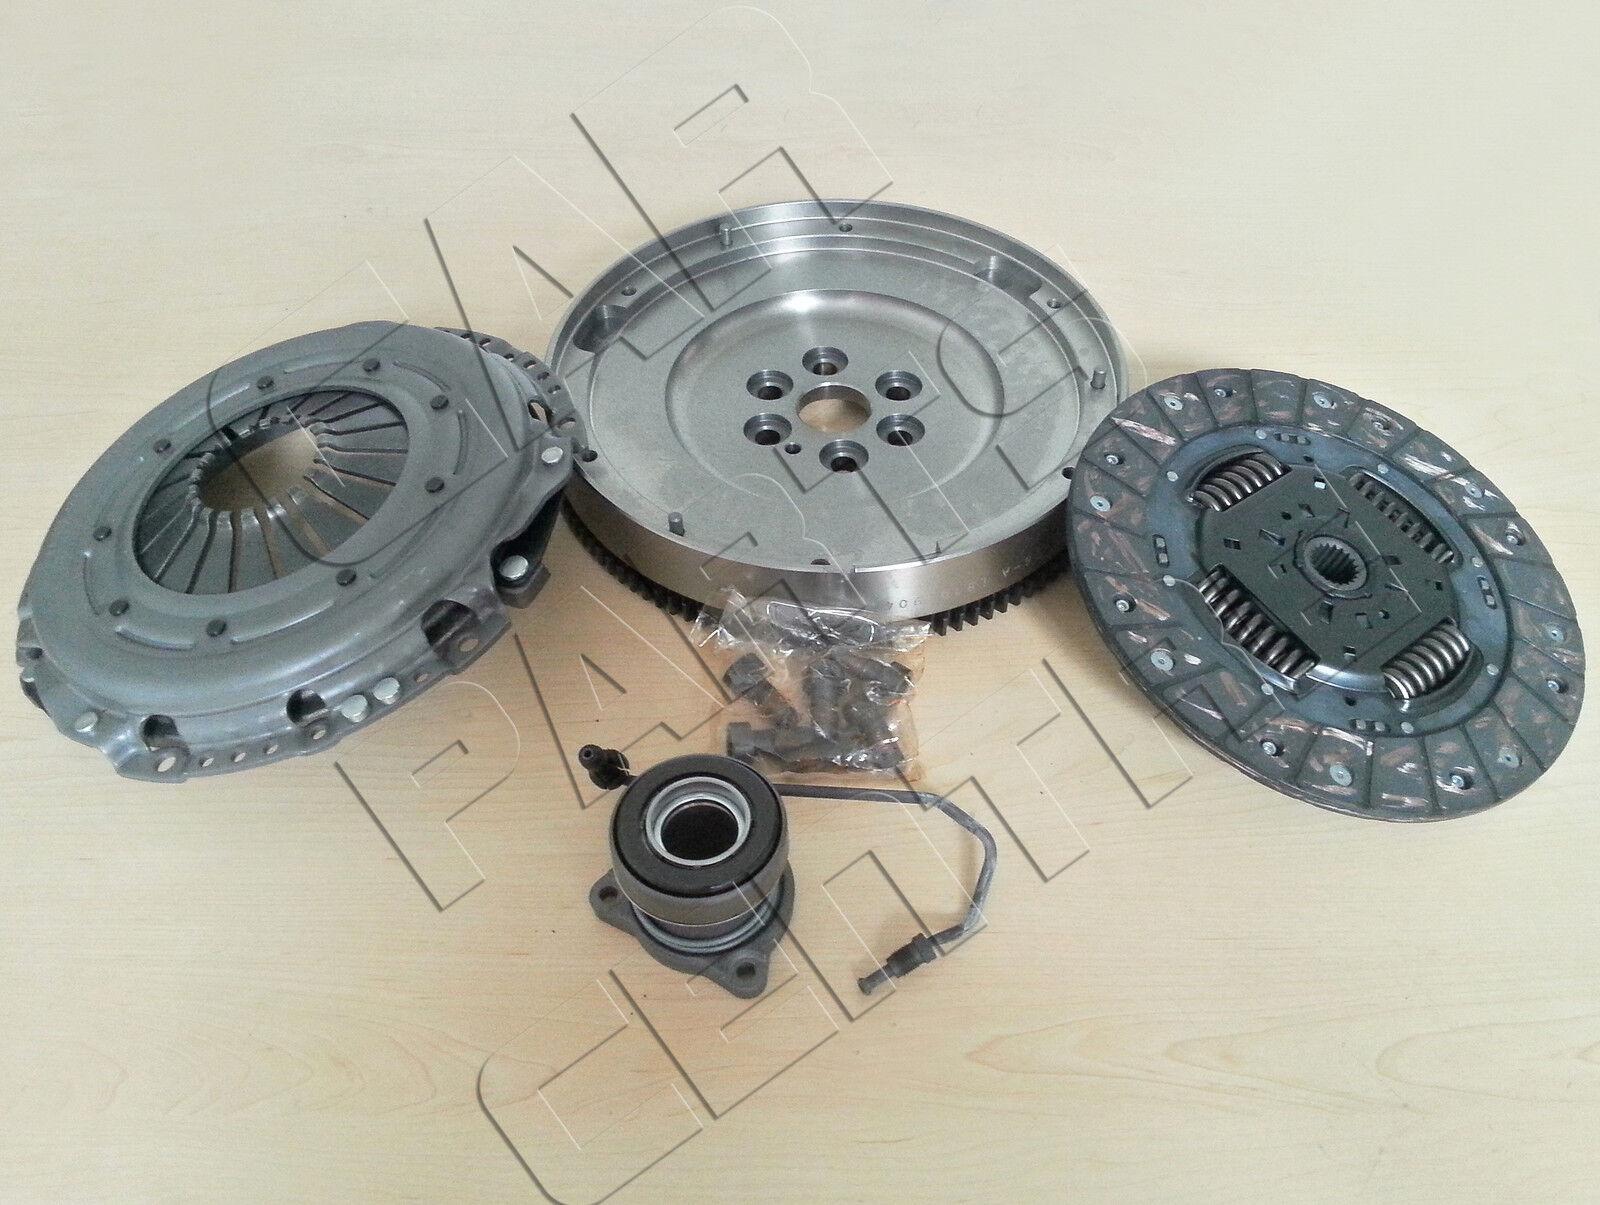 FOR ASTRA 1.9 CDTI 150 BHP SRI DUAL TO SOLID MASS FLYWHEEL CONVERSION CLUTCH KIT | eBay